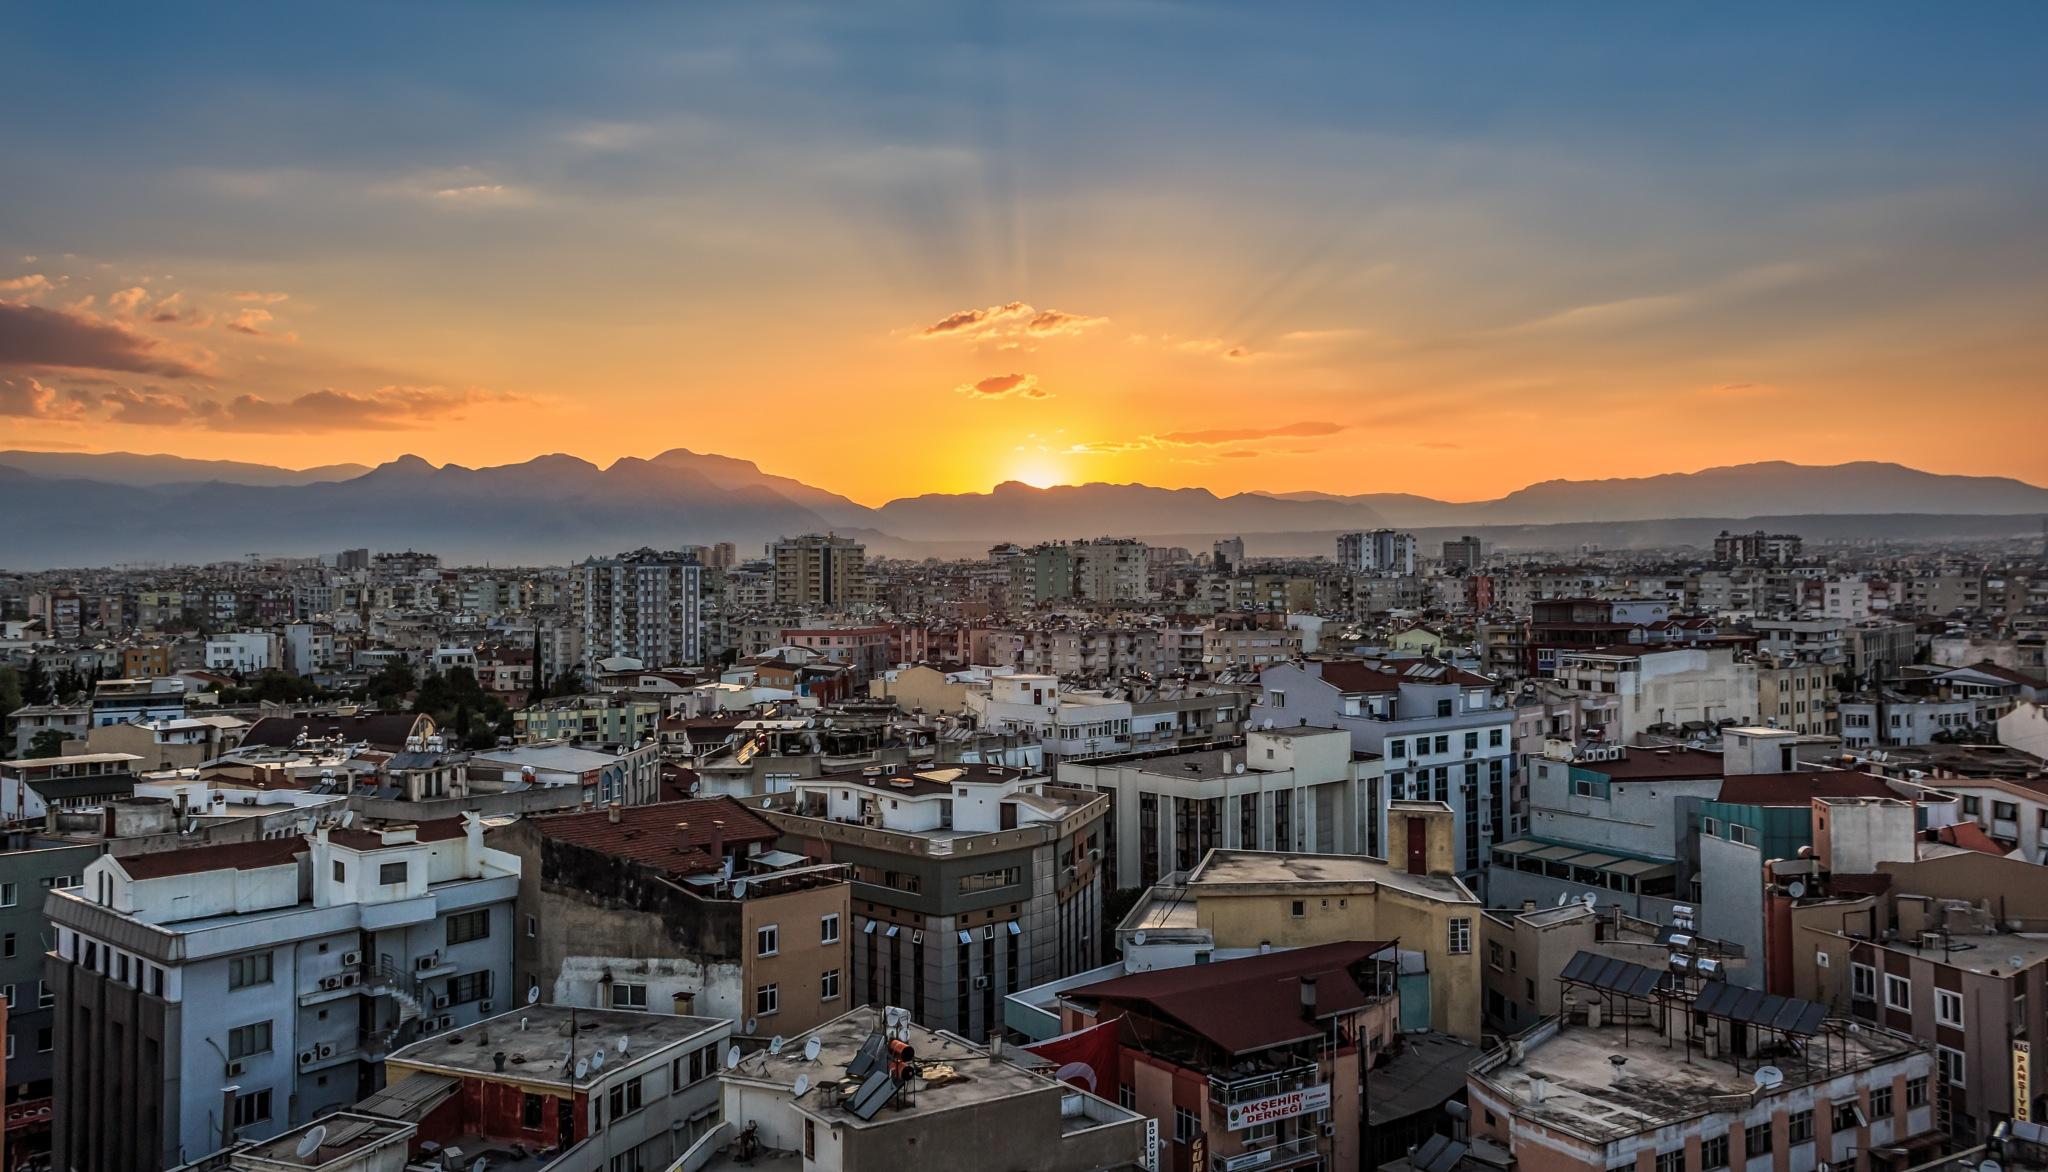 Sunset in Antalya by Mohammed Shamaa